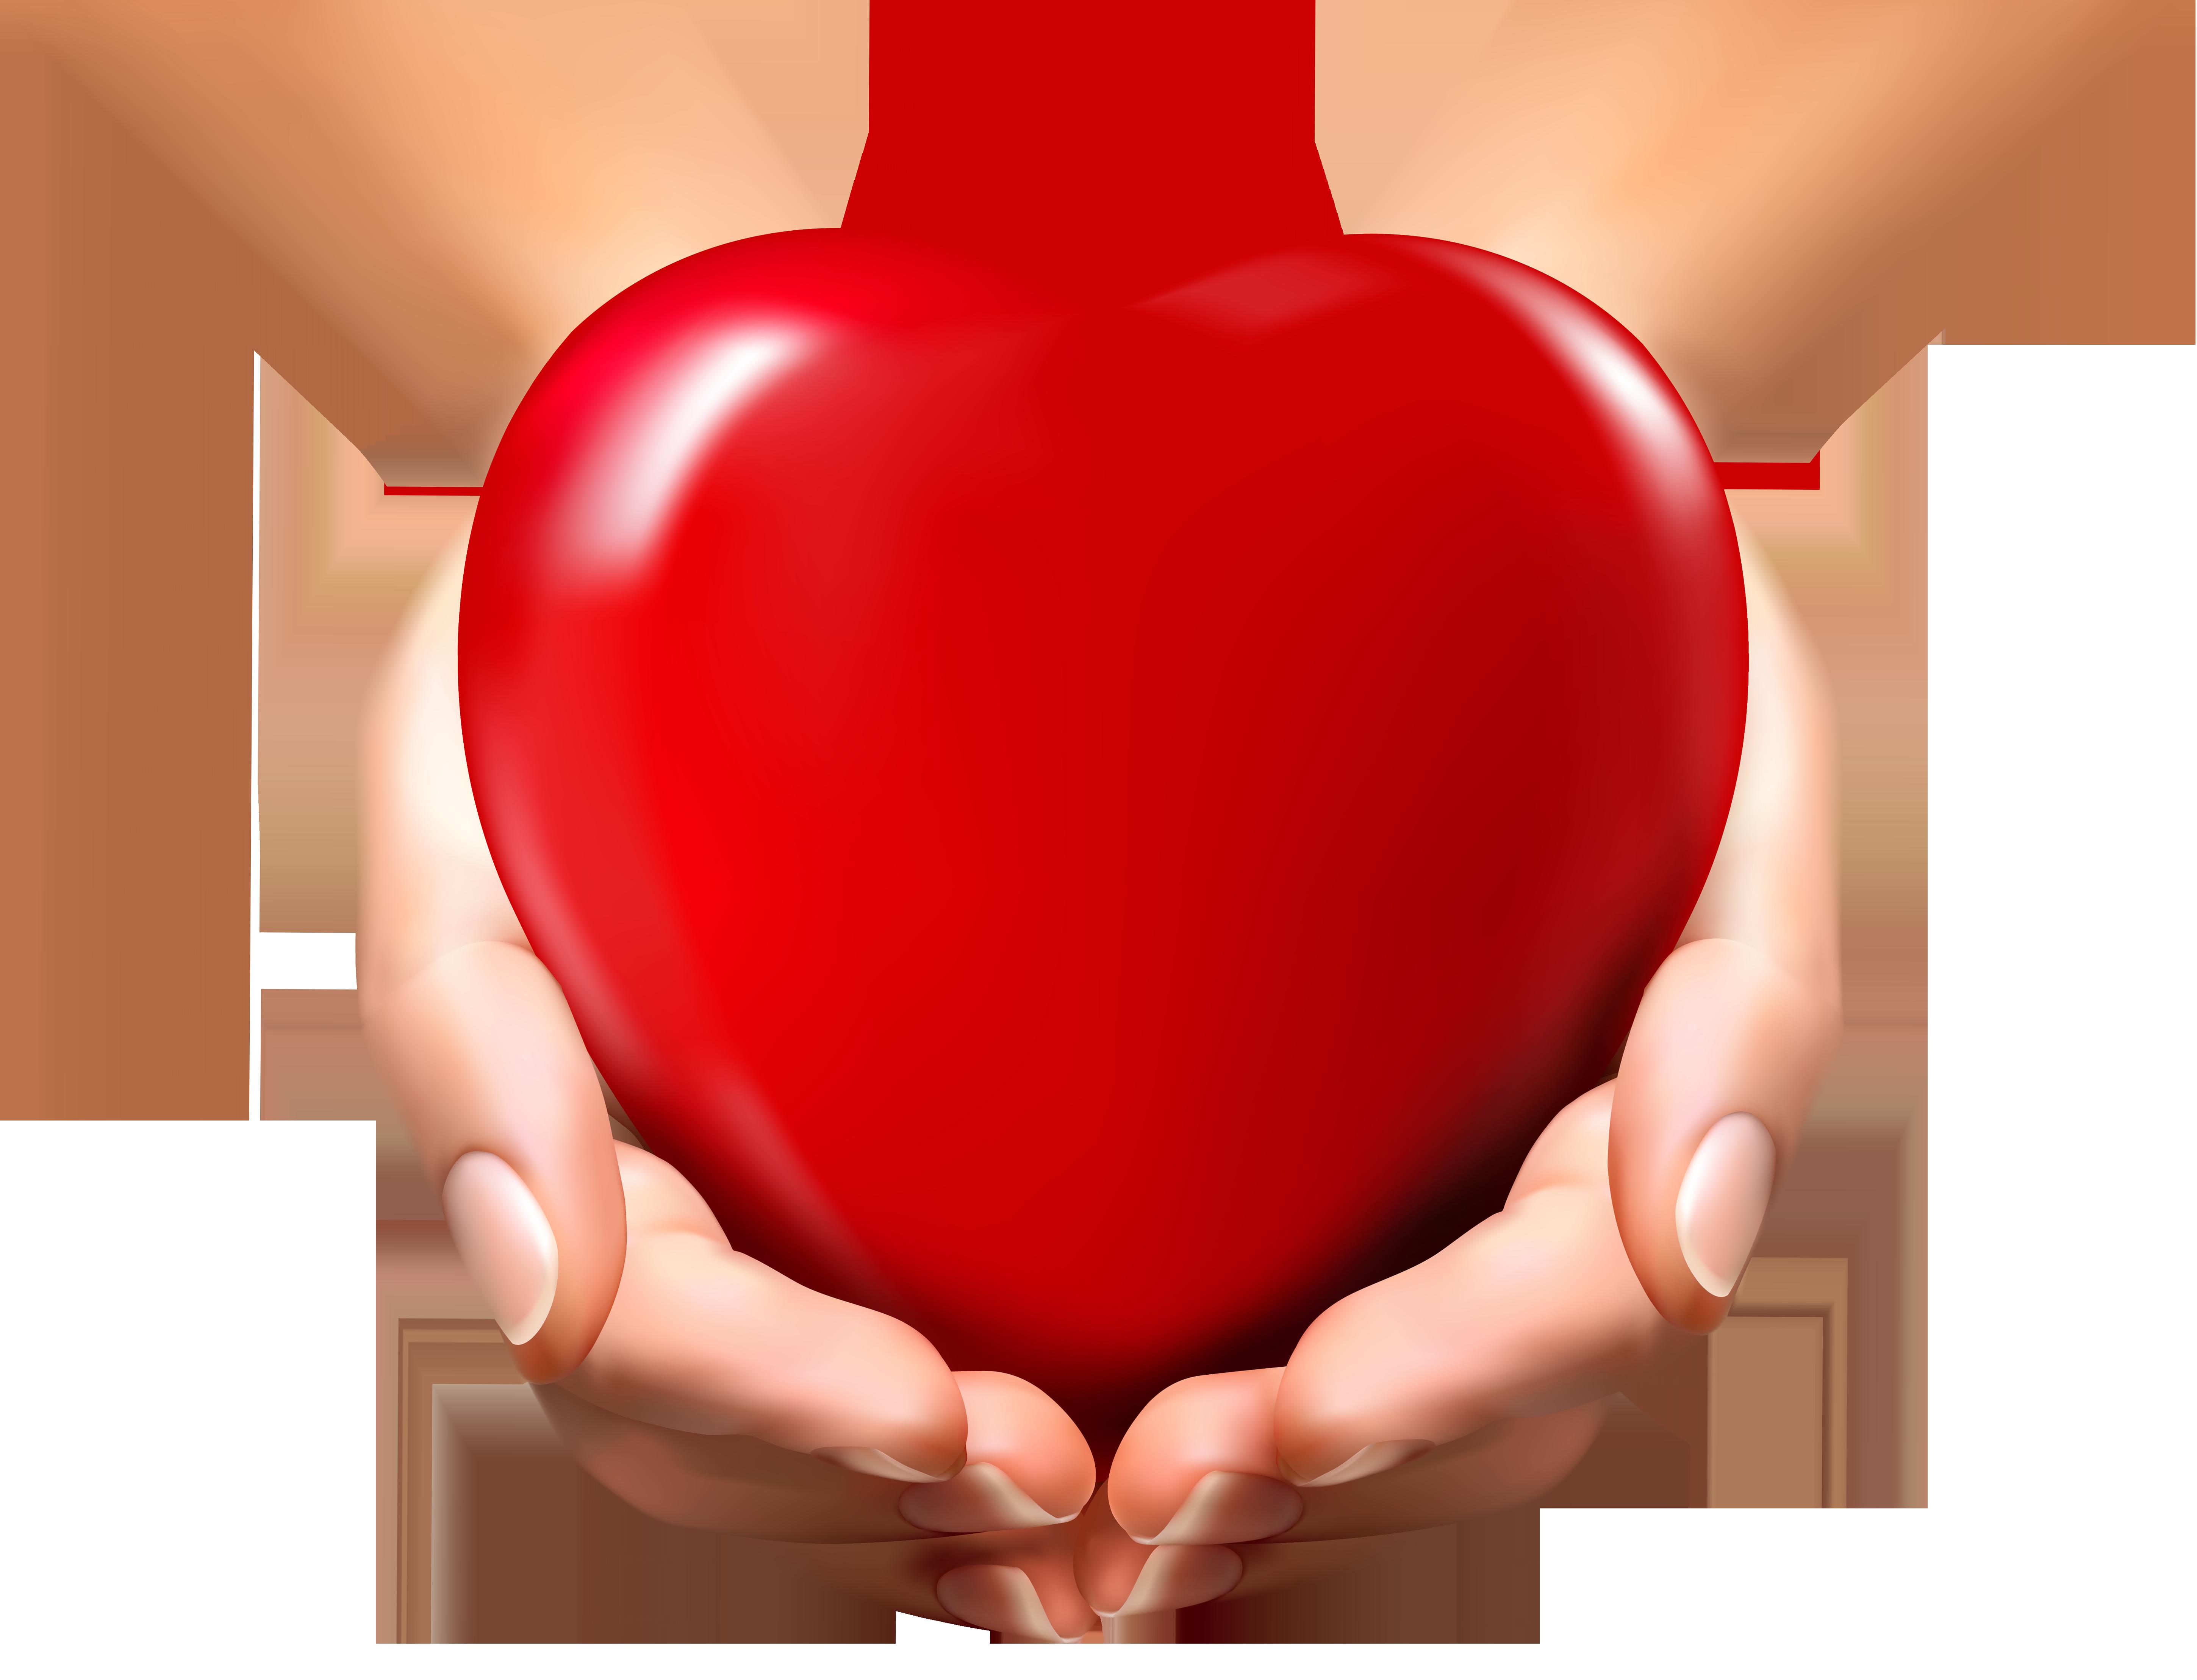 5799x4435 Clipart Heart In Hands